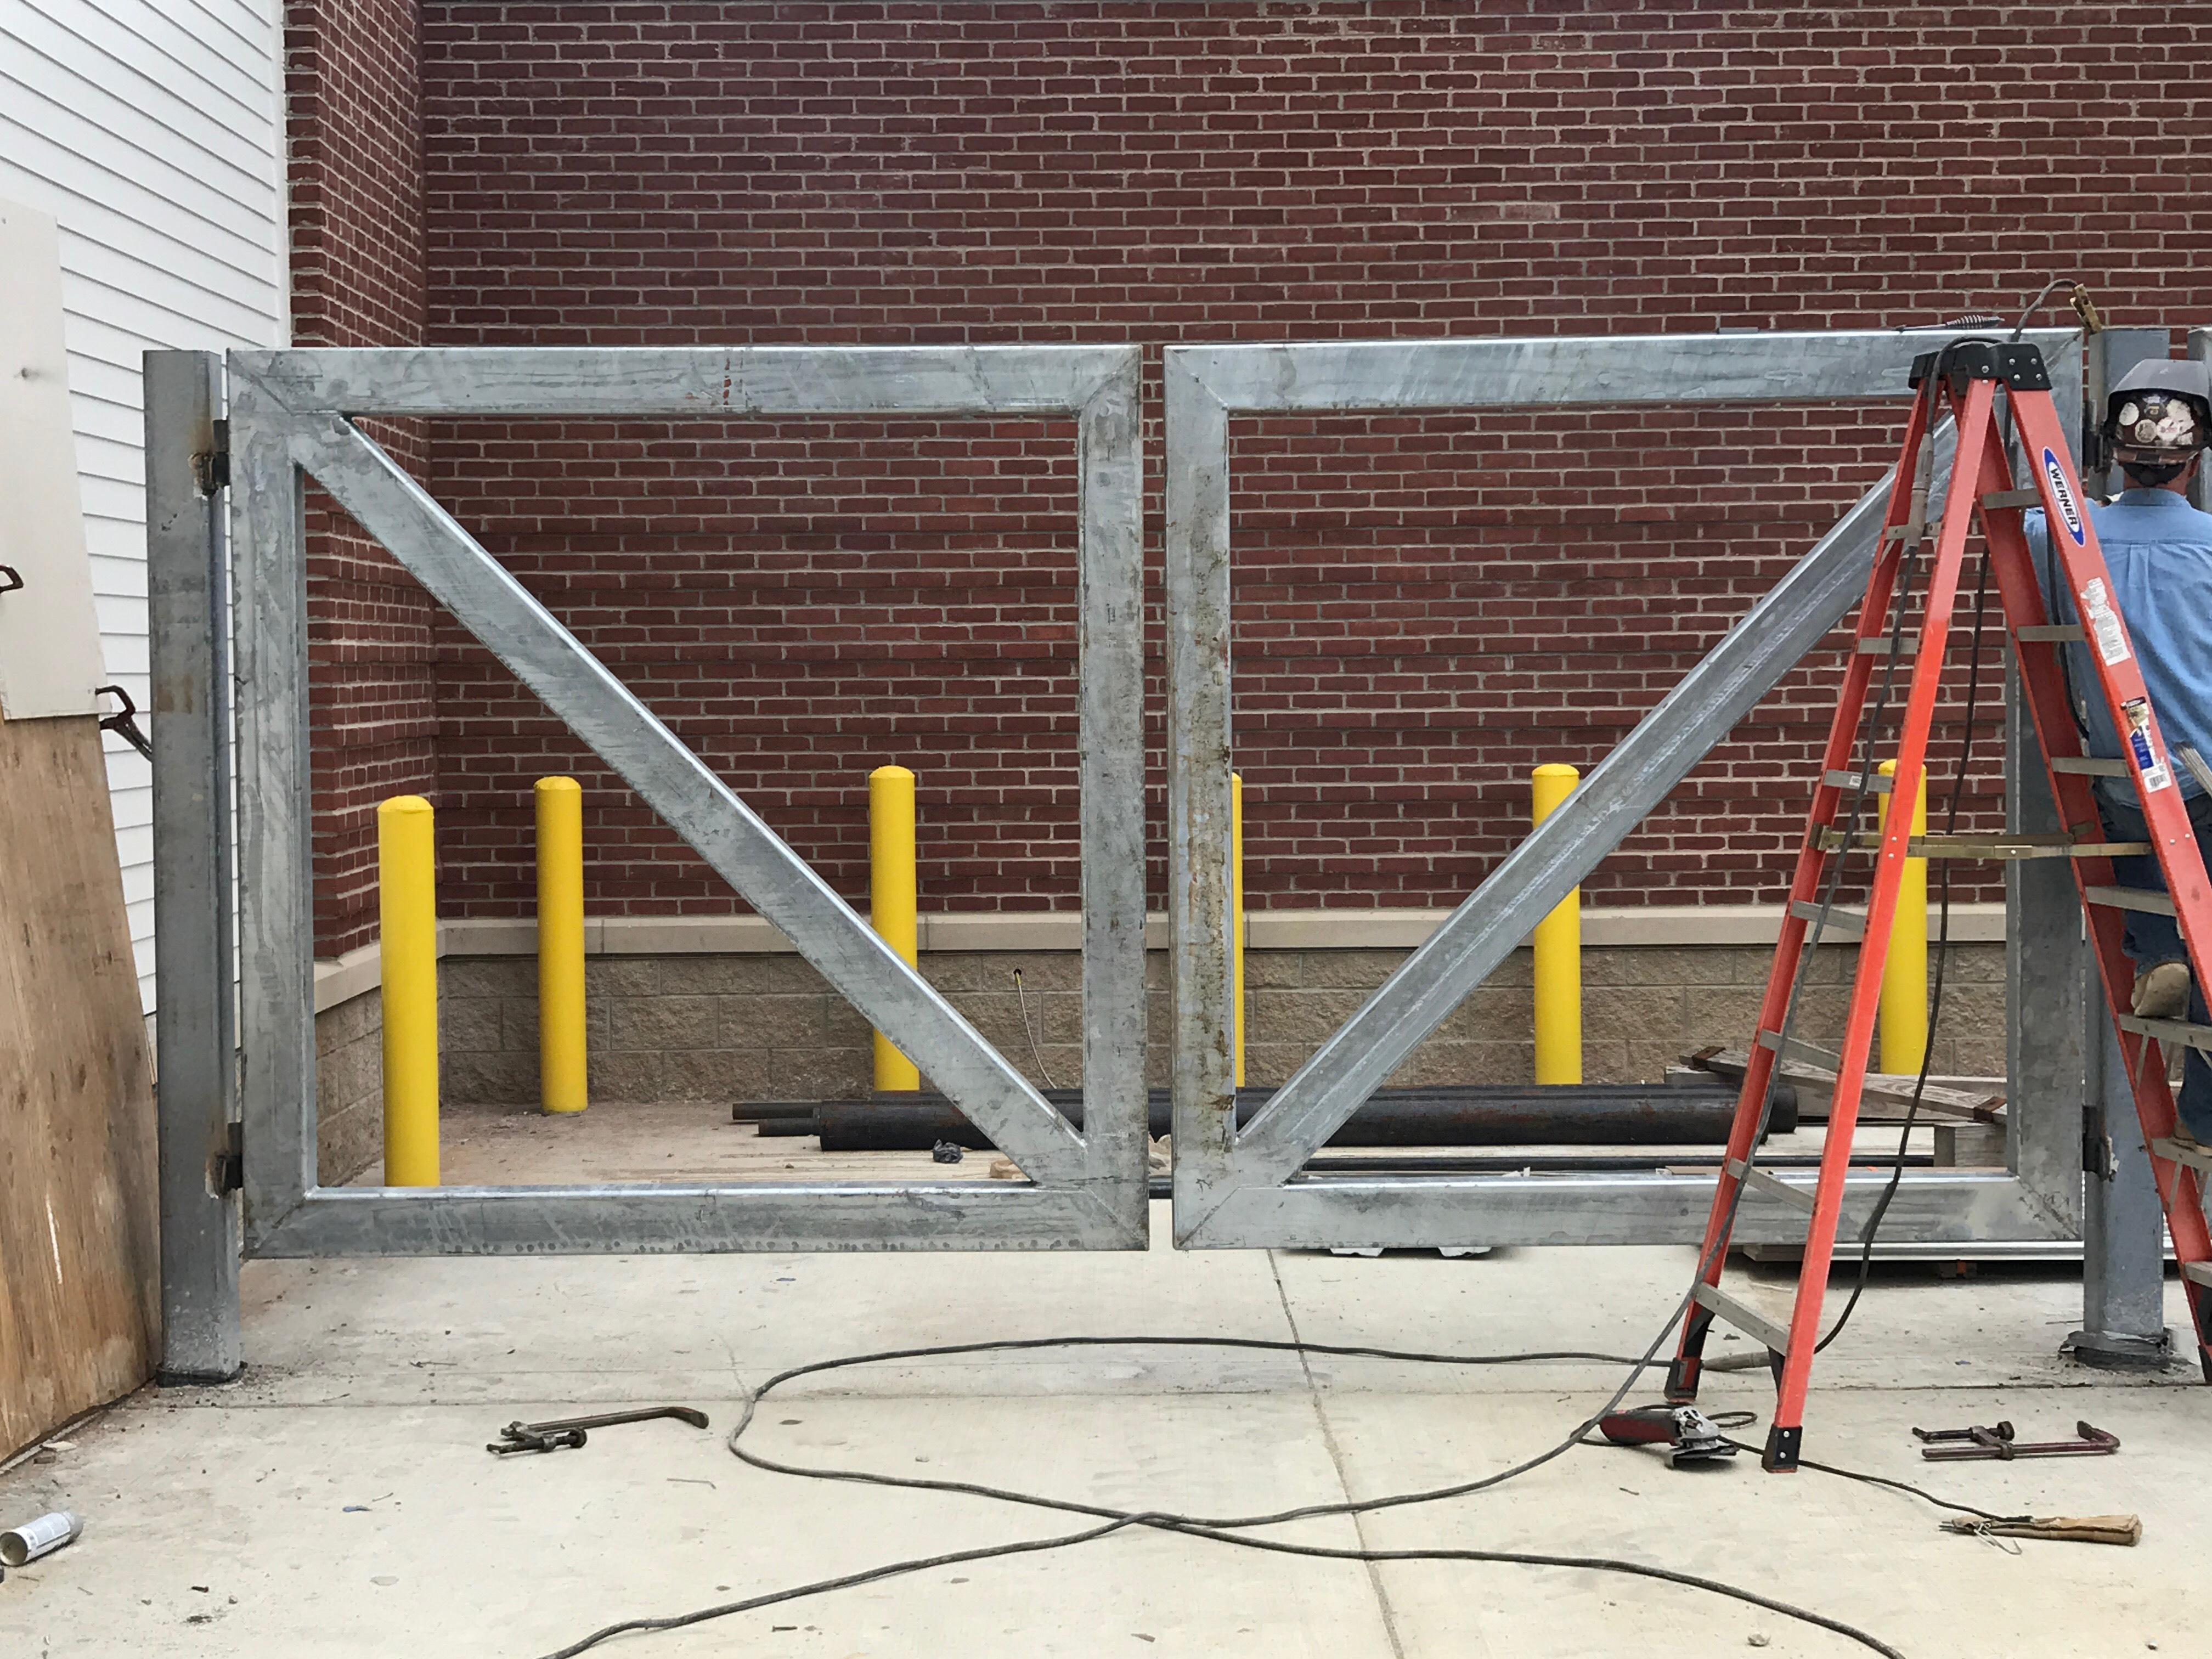 dumpster gates.jpeg